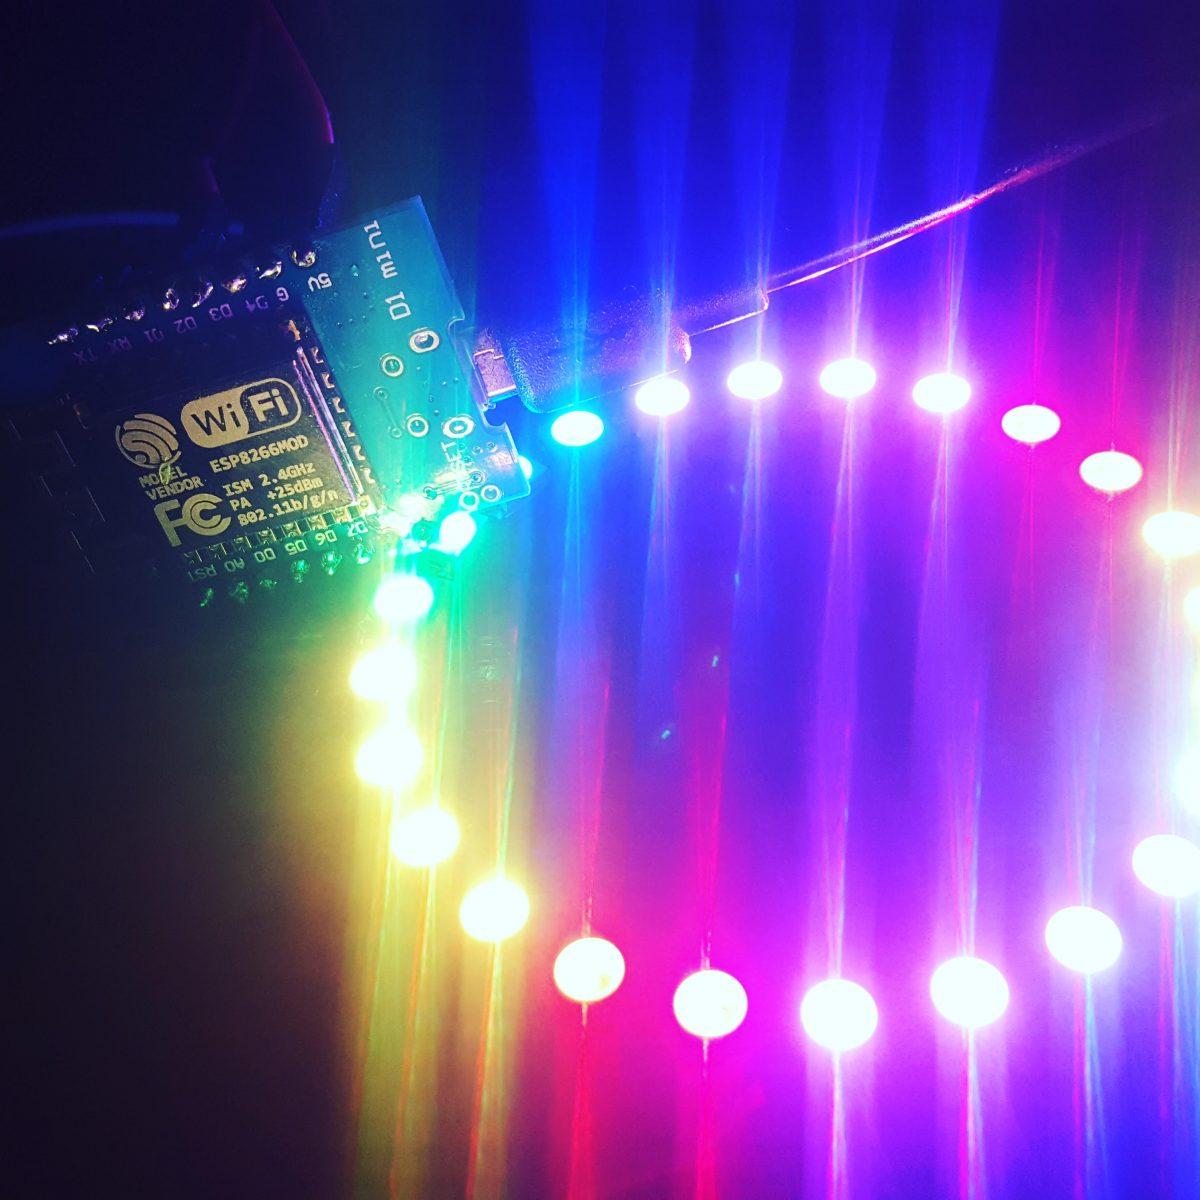 RGB NEOPIXEL RING + Wemos D1 Mini – Light Notification Panel